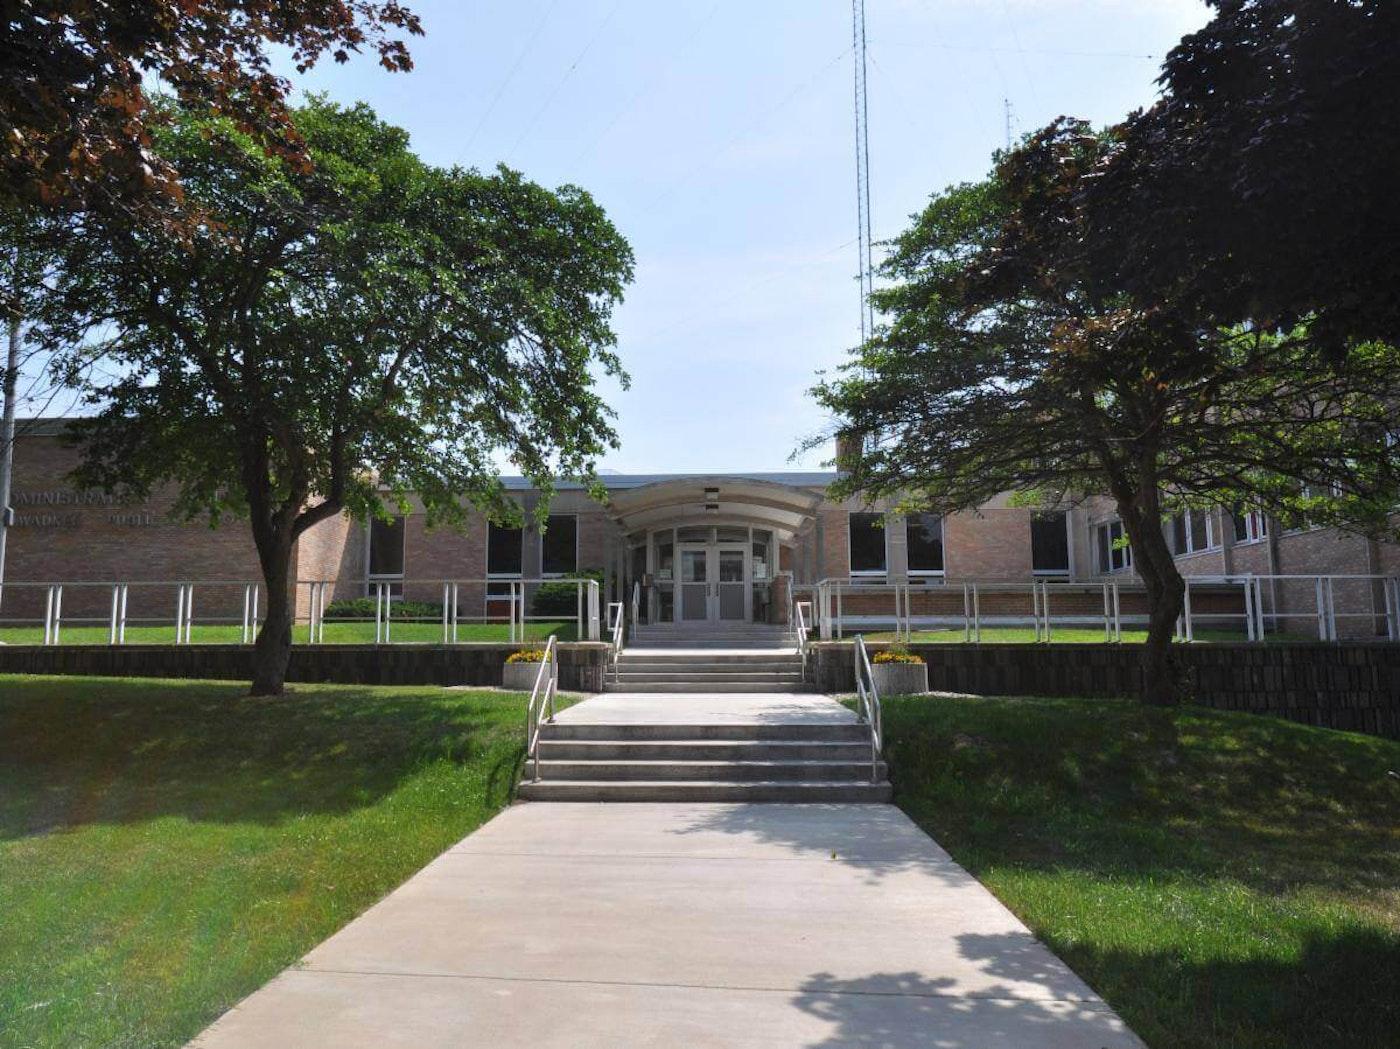 The Milwaukee Public Schools administration building is shown. (Photo via Milwaukee Public Schools/Facebook)